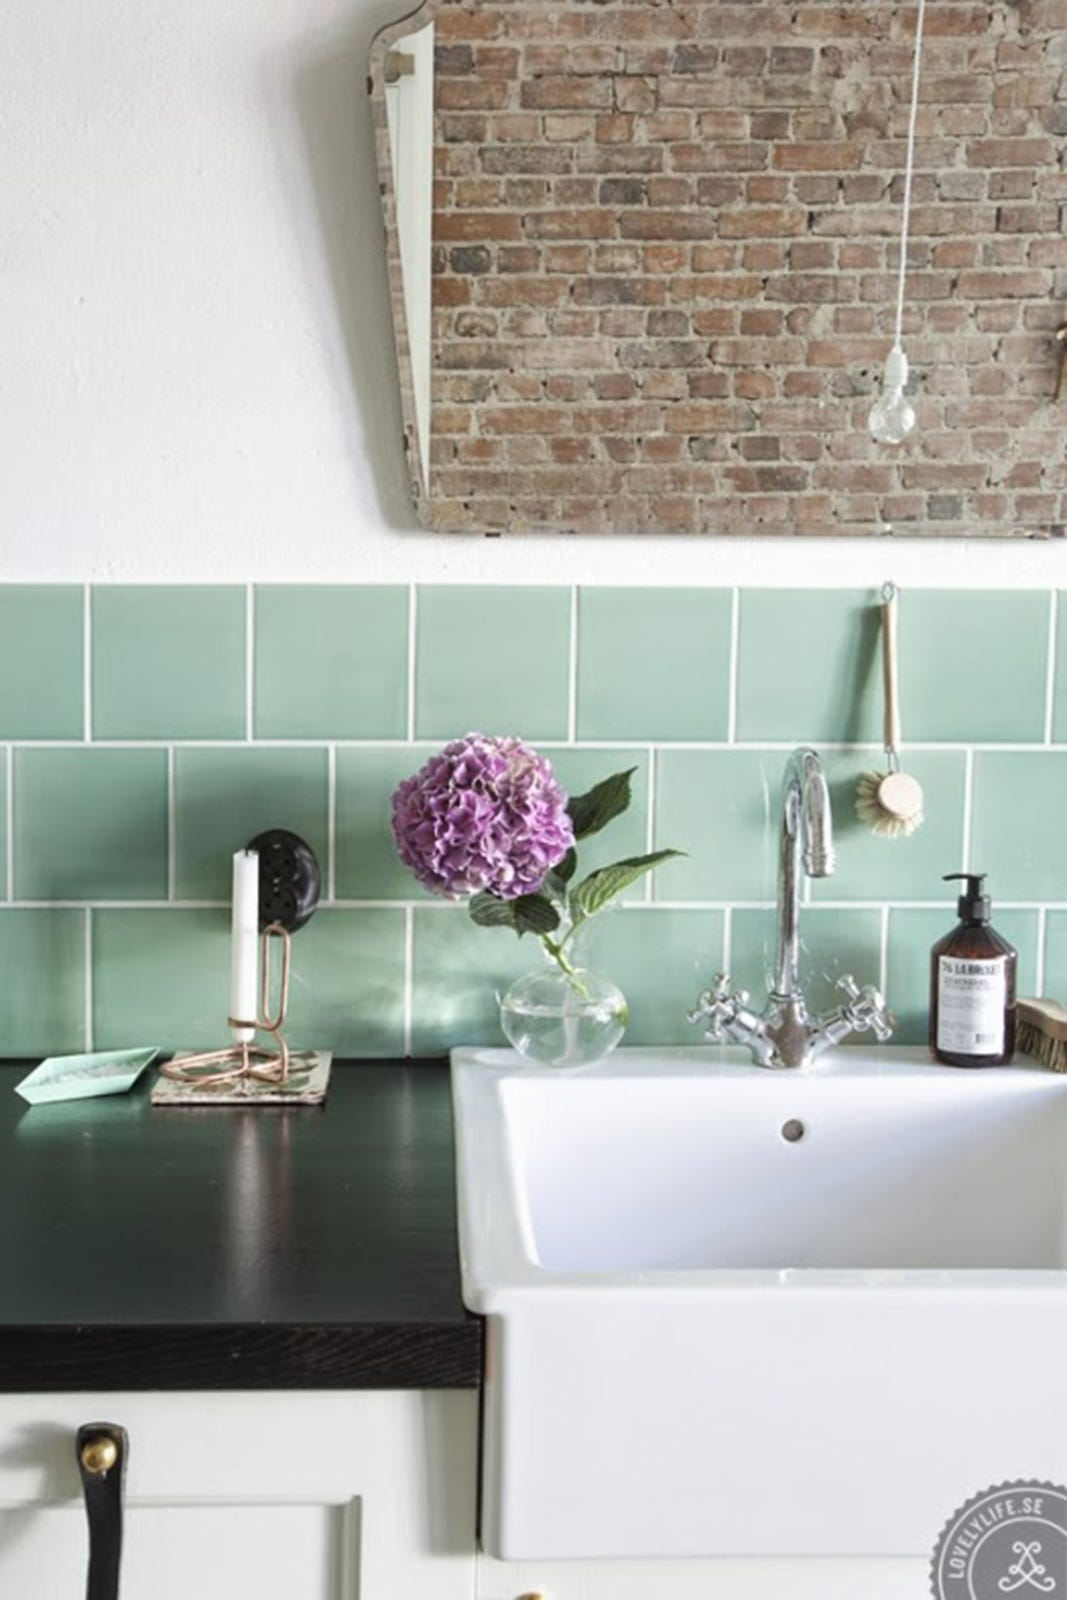 Mint Green Kitchen Backsplash Tiles